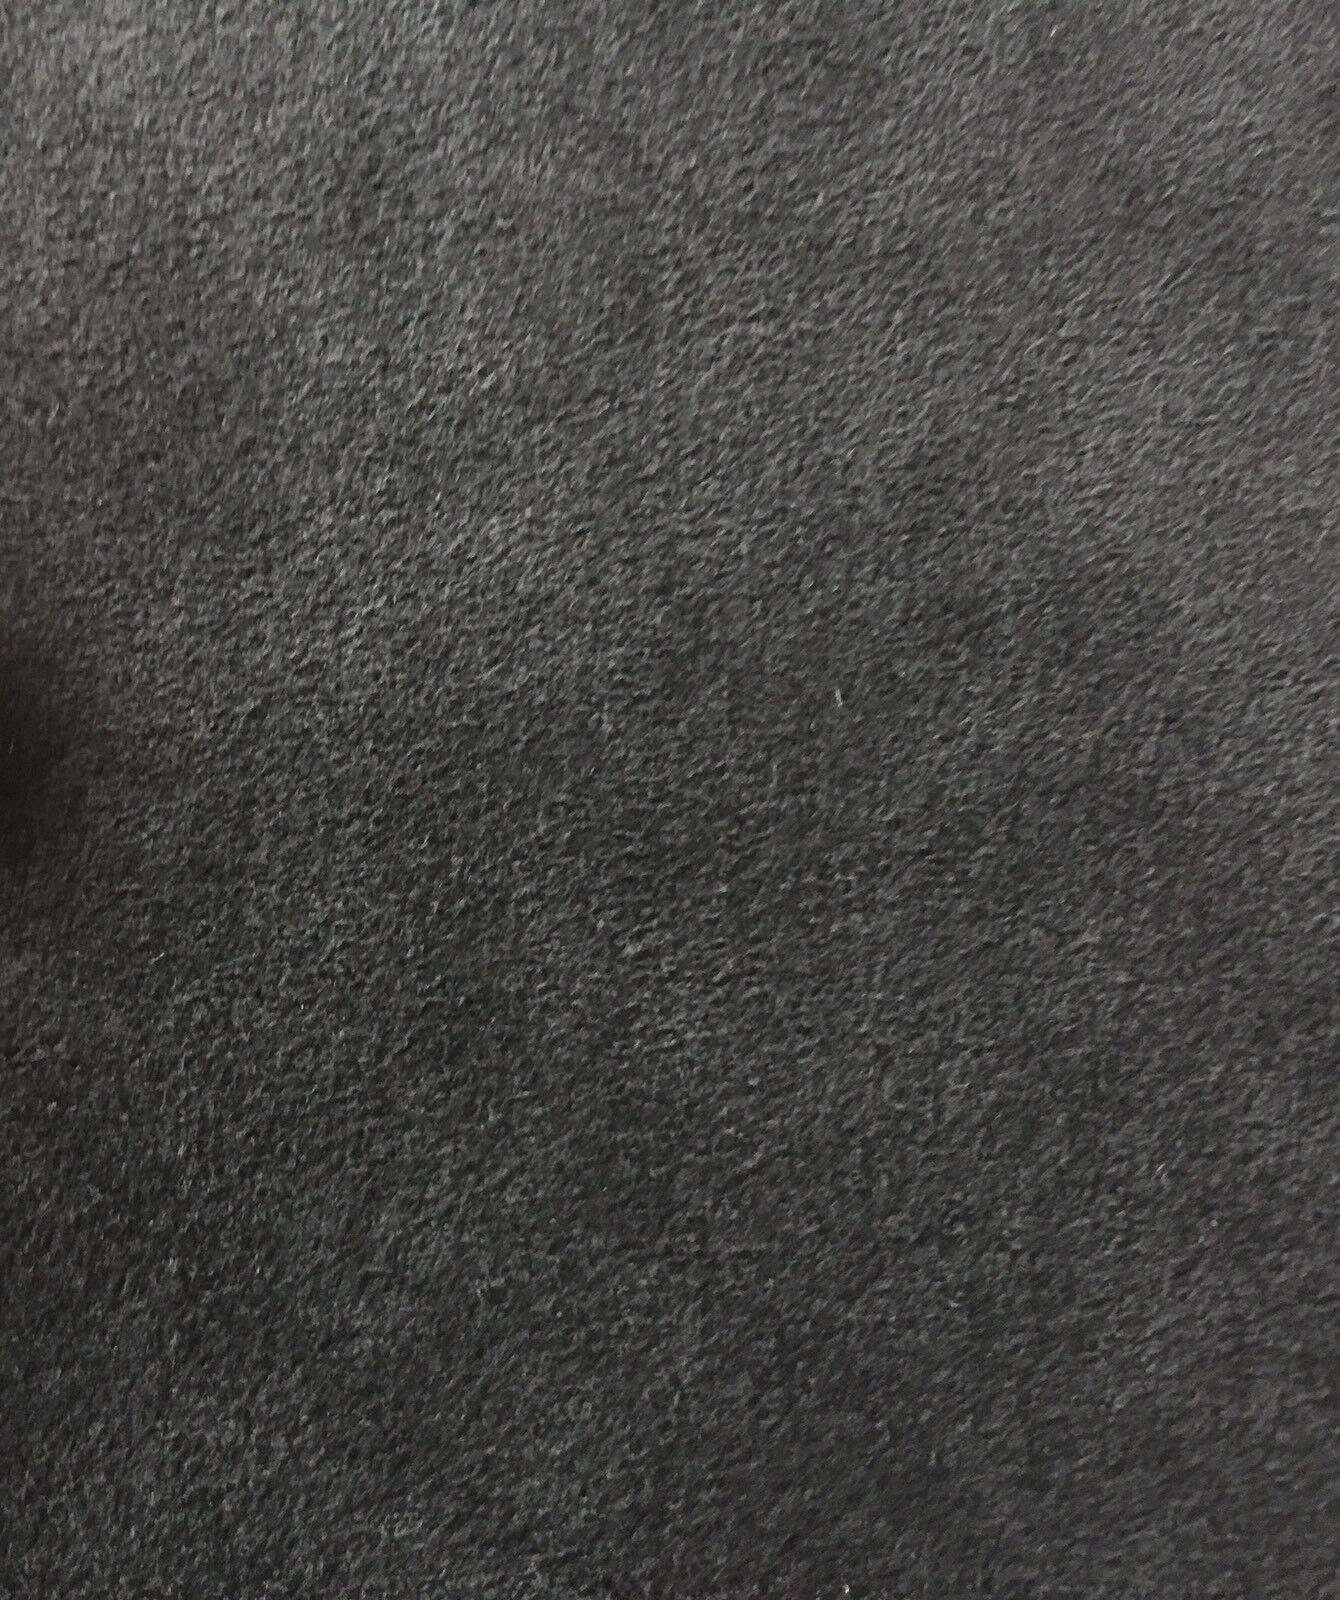 original alcantara stoff schwarz cover mit 1mm schaumstoff. Black Bedroom Furniture Sets. Home Design Ideas